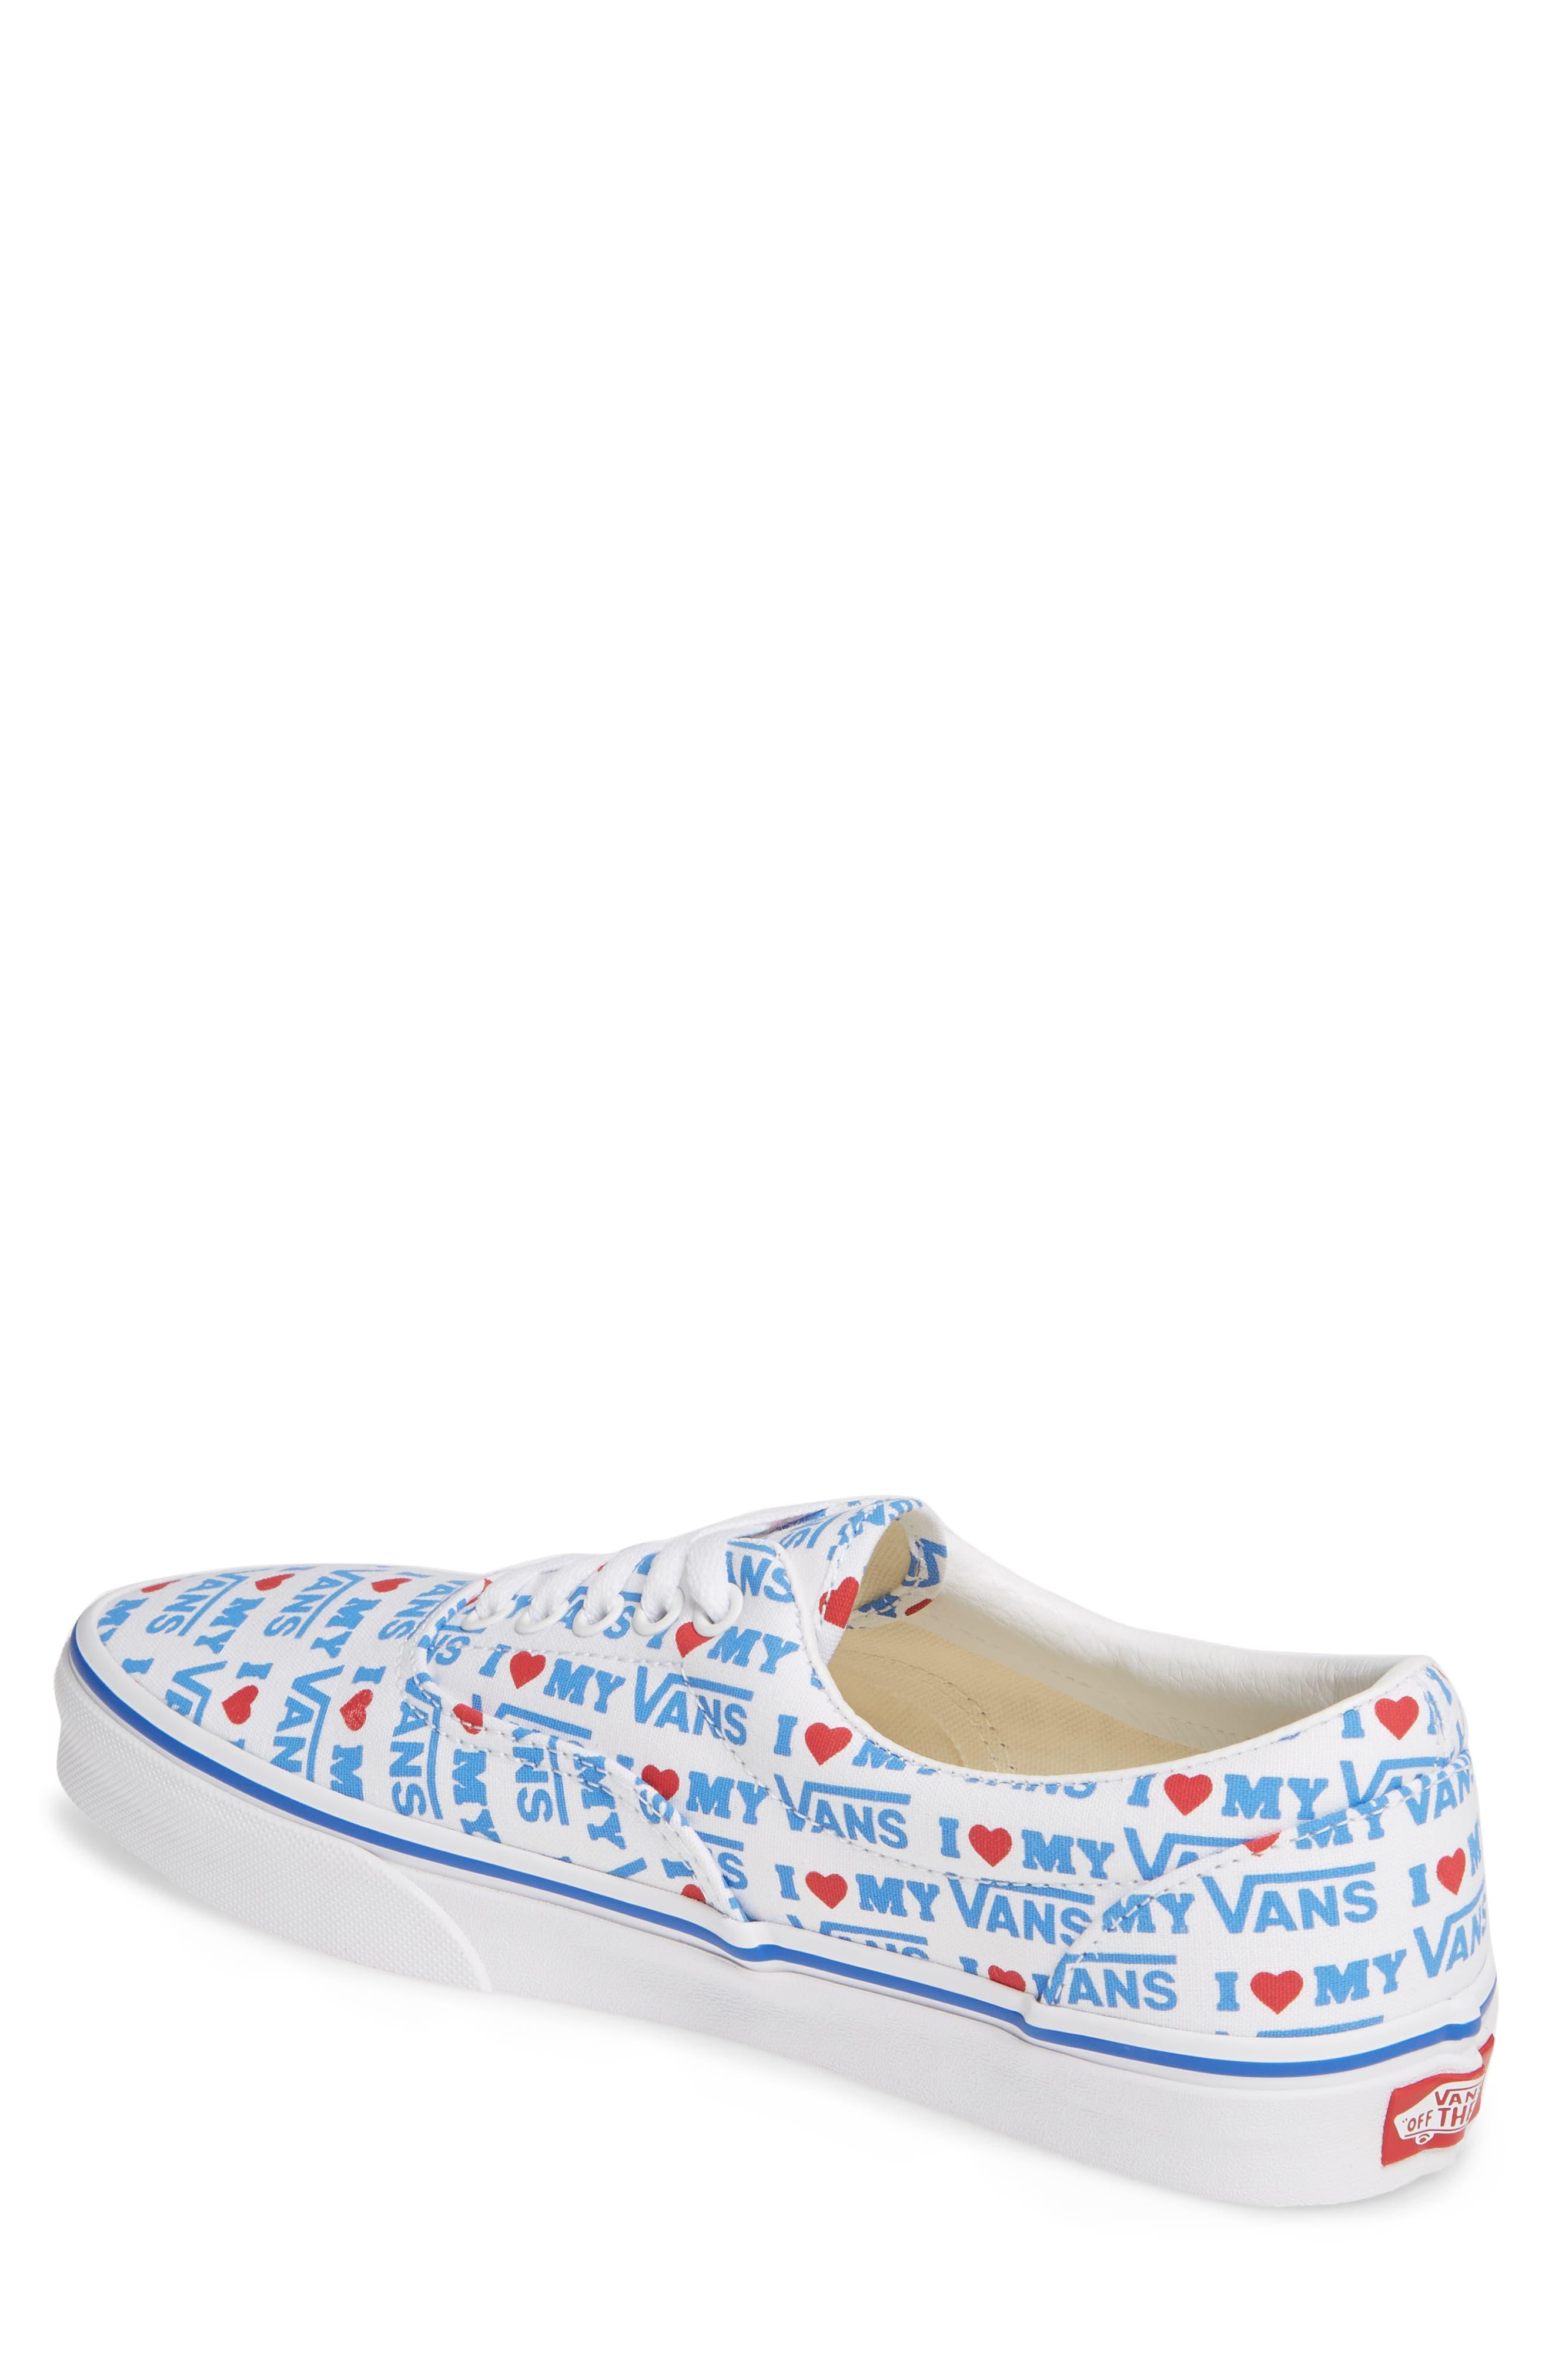 98b7e13e0c Vans Men s Shoes   Sneakers